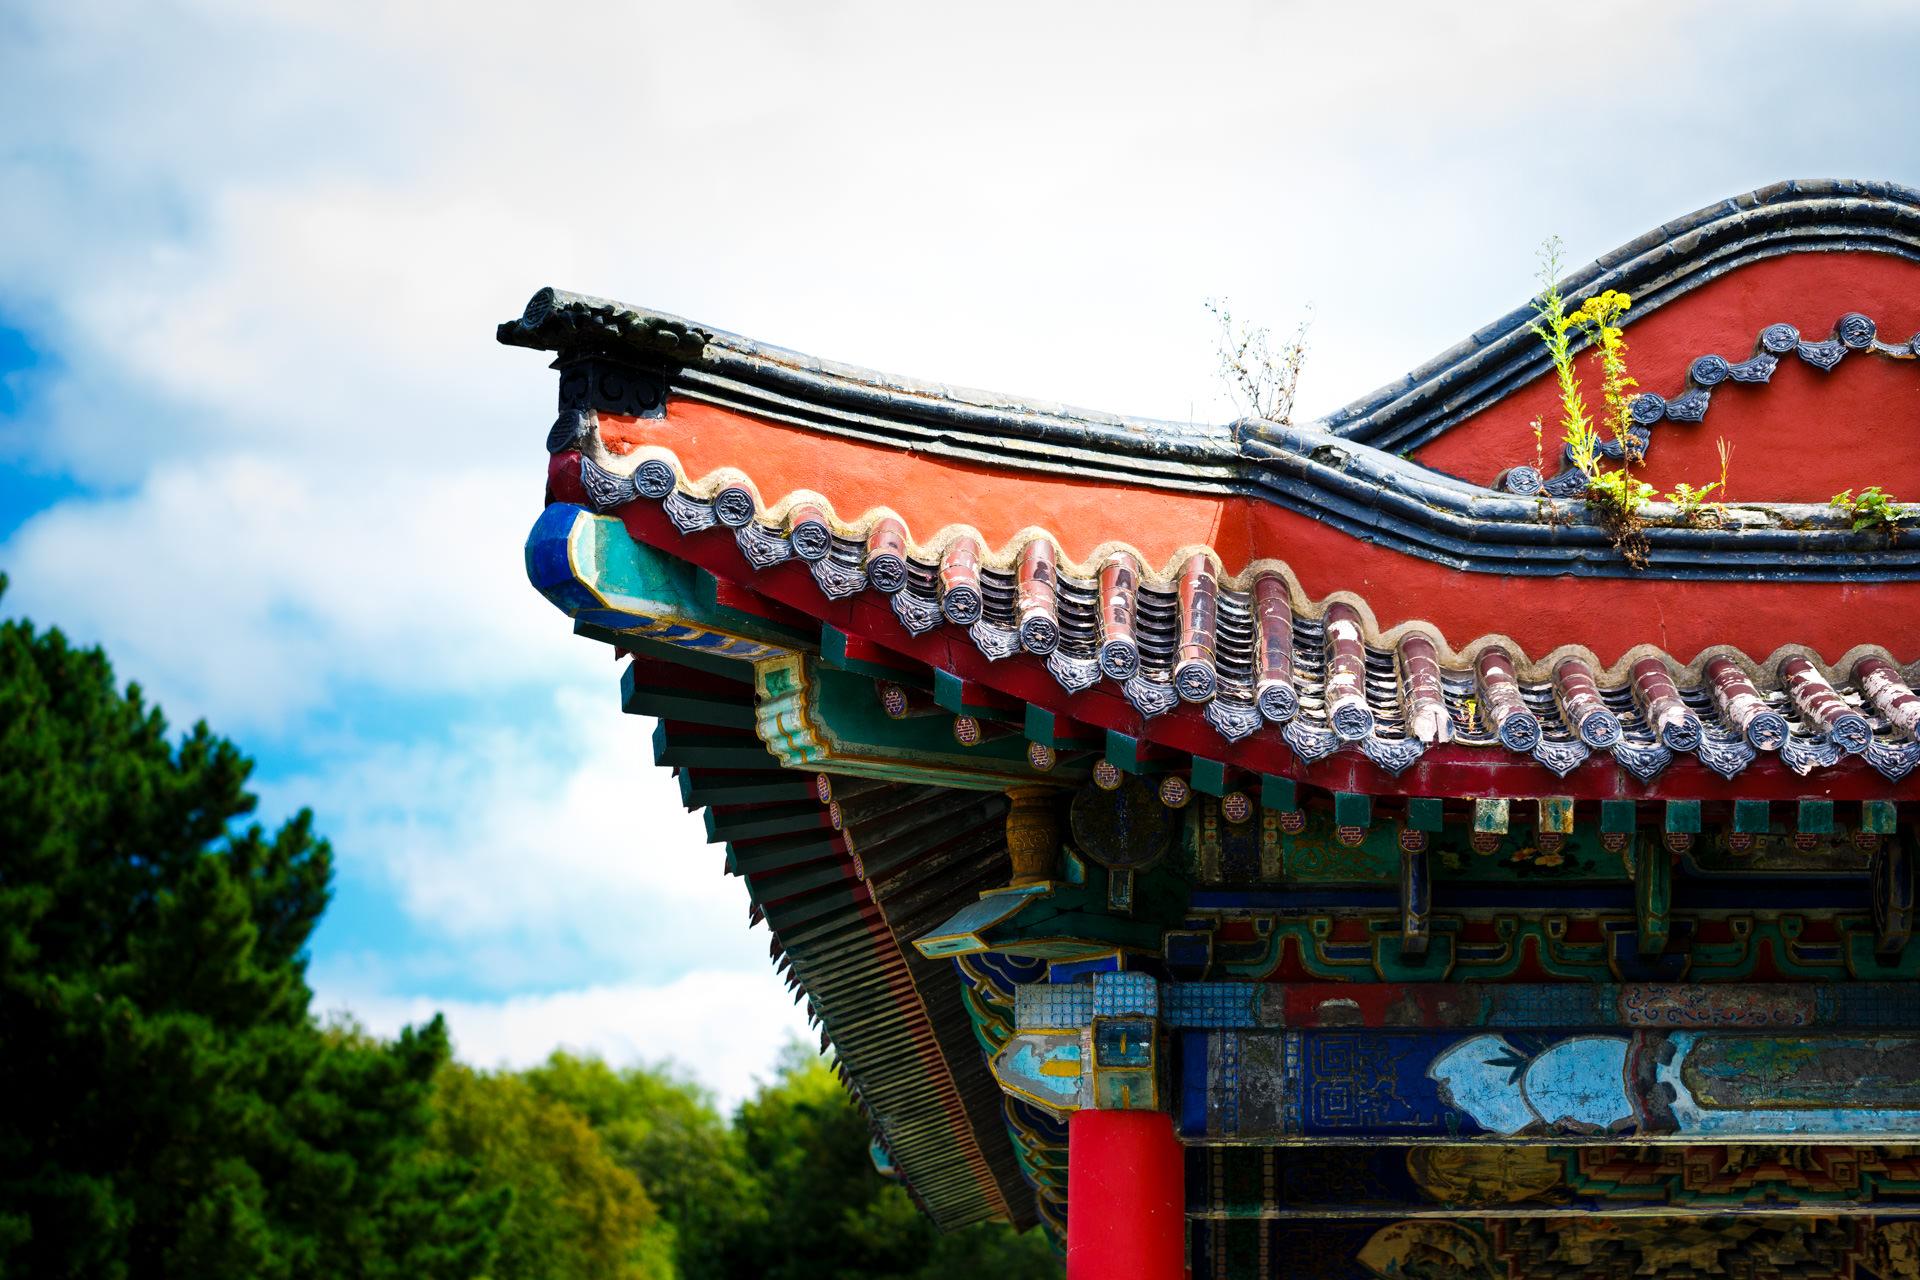 Andrew Wilson Photography Liverpool (11) Festival Gardens Chinese Pagoda.jpg